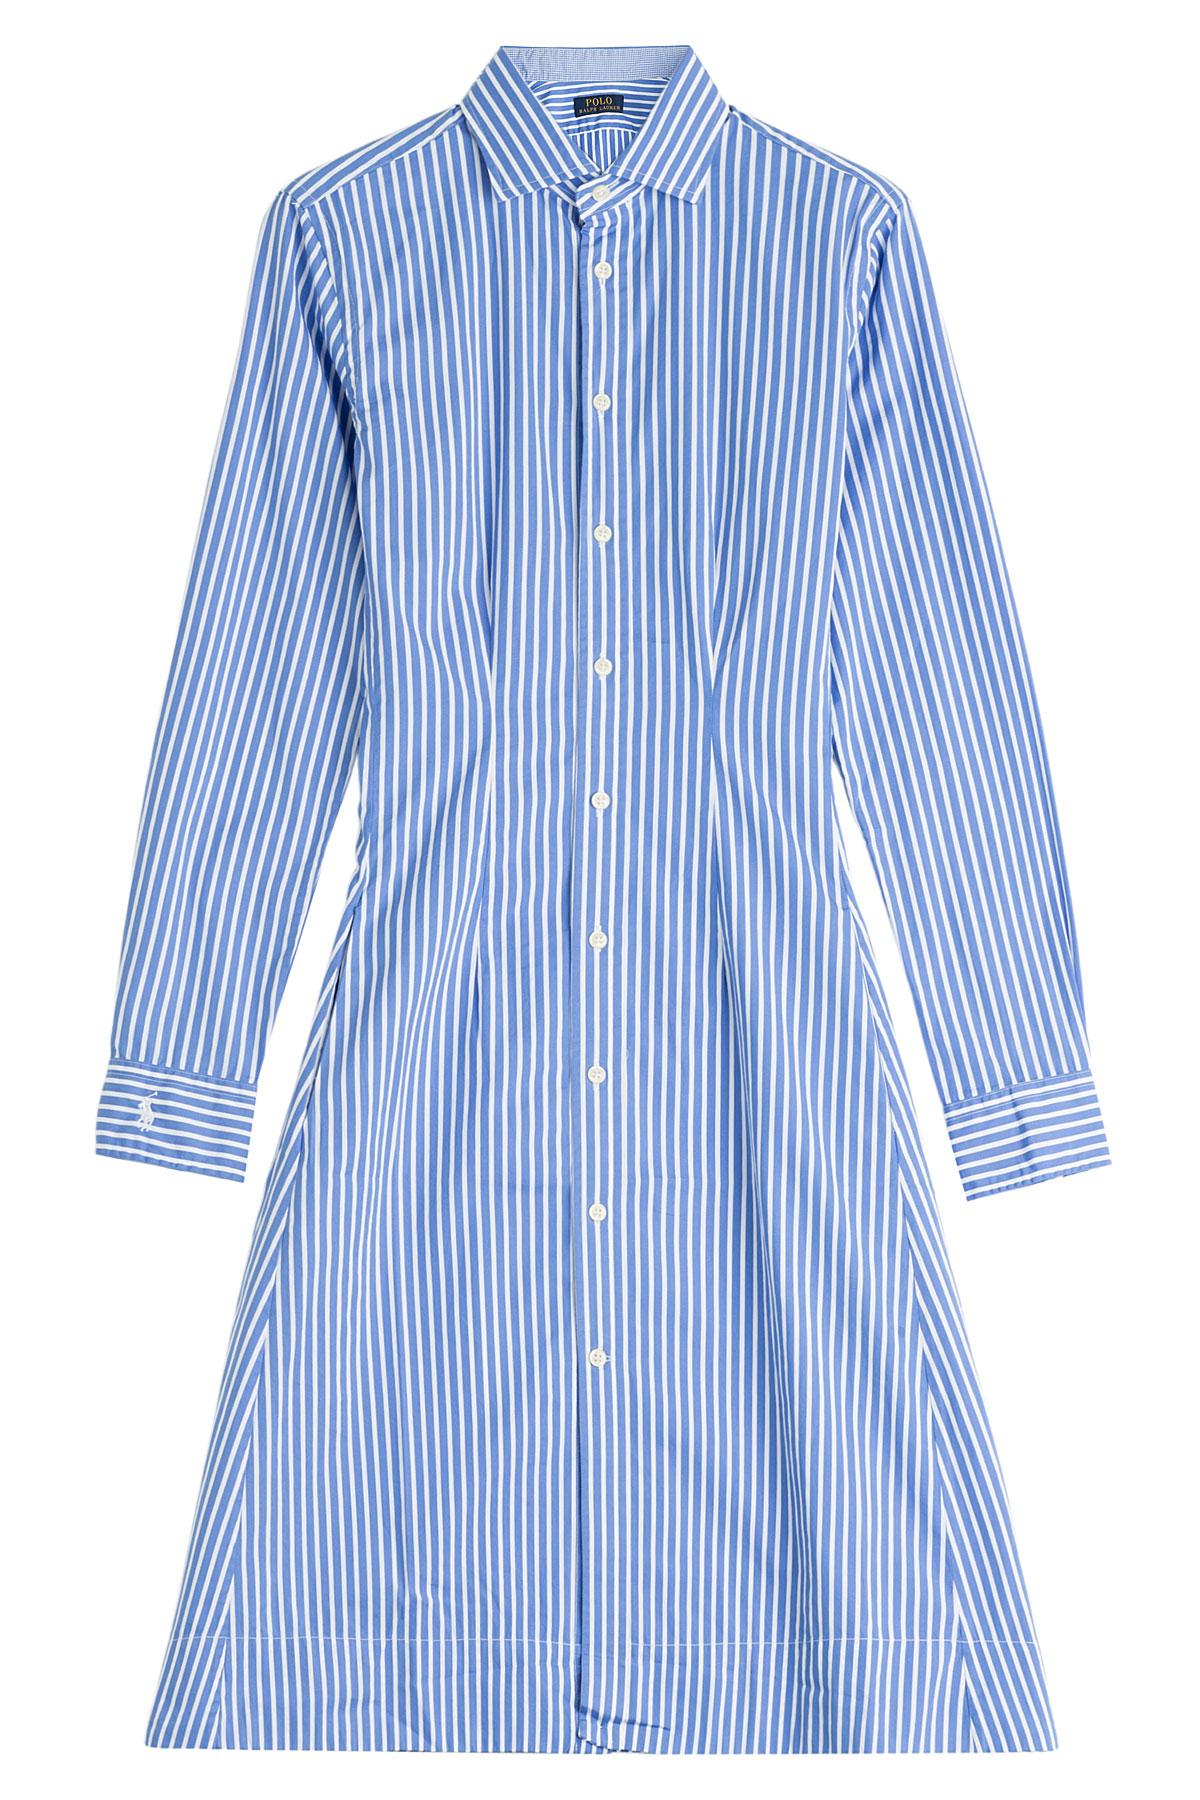 Polo Ralph Lauren Long Sleeve Olivia Cotton Shirt Dress In